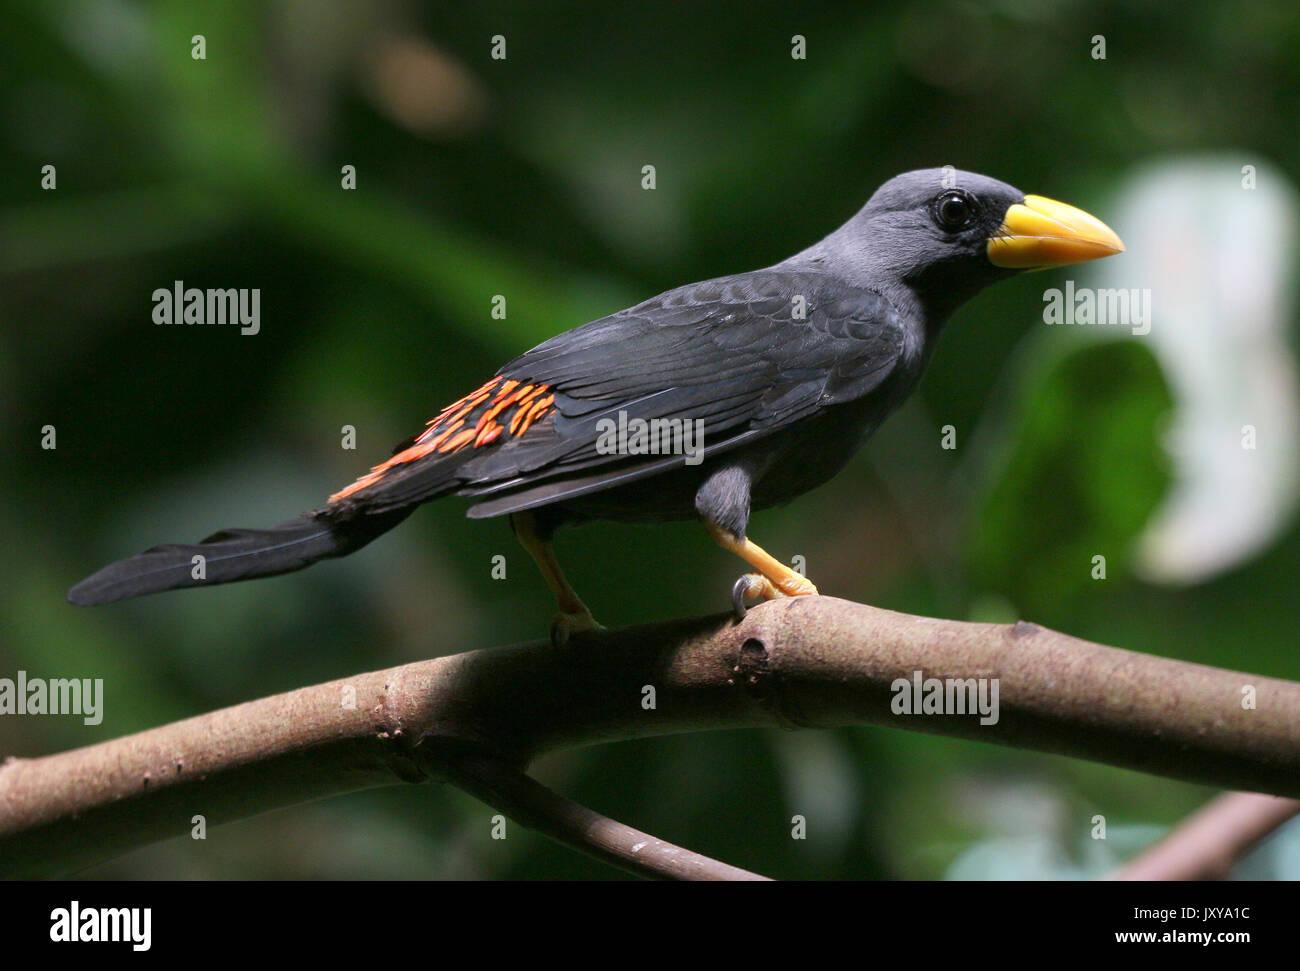 Sulawesi  Grosbeak starling or grosbeak myna (Scissirostrum dubium). A.k.a. Celebes finch billed or scissor billed starling. - Stock Image